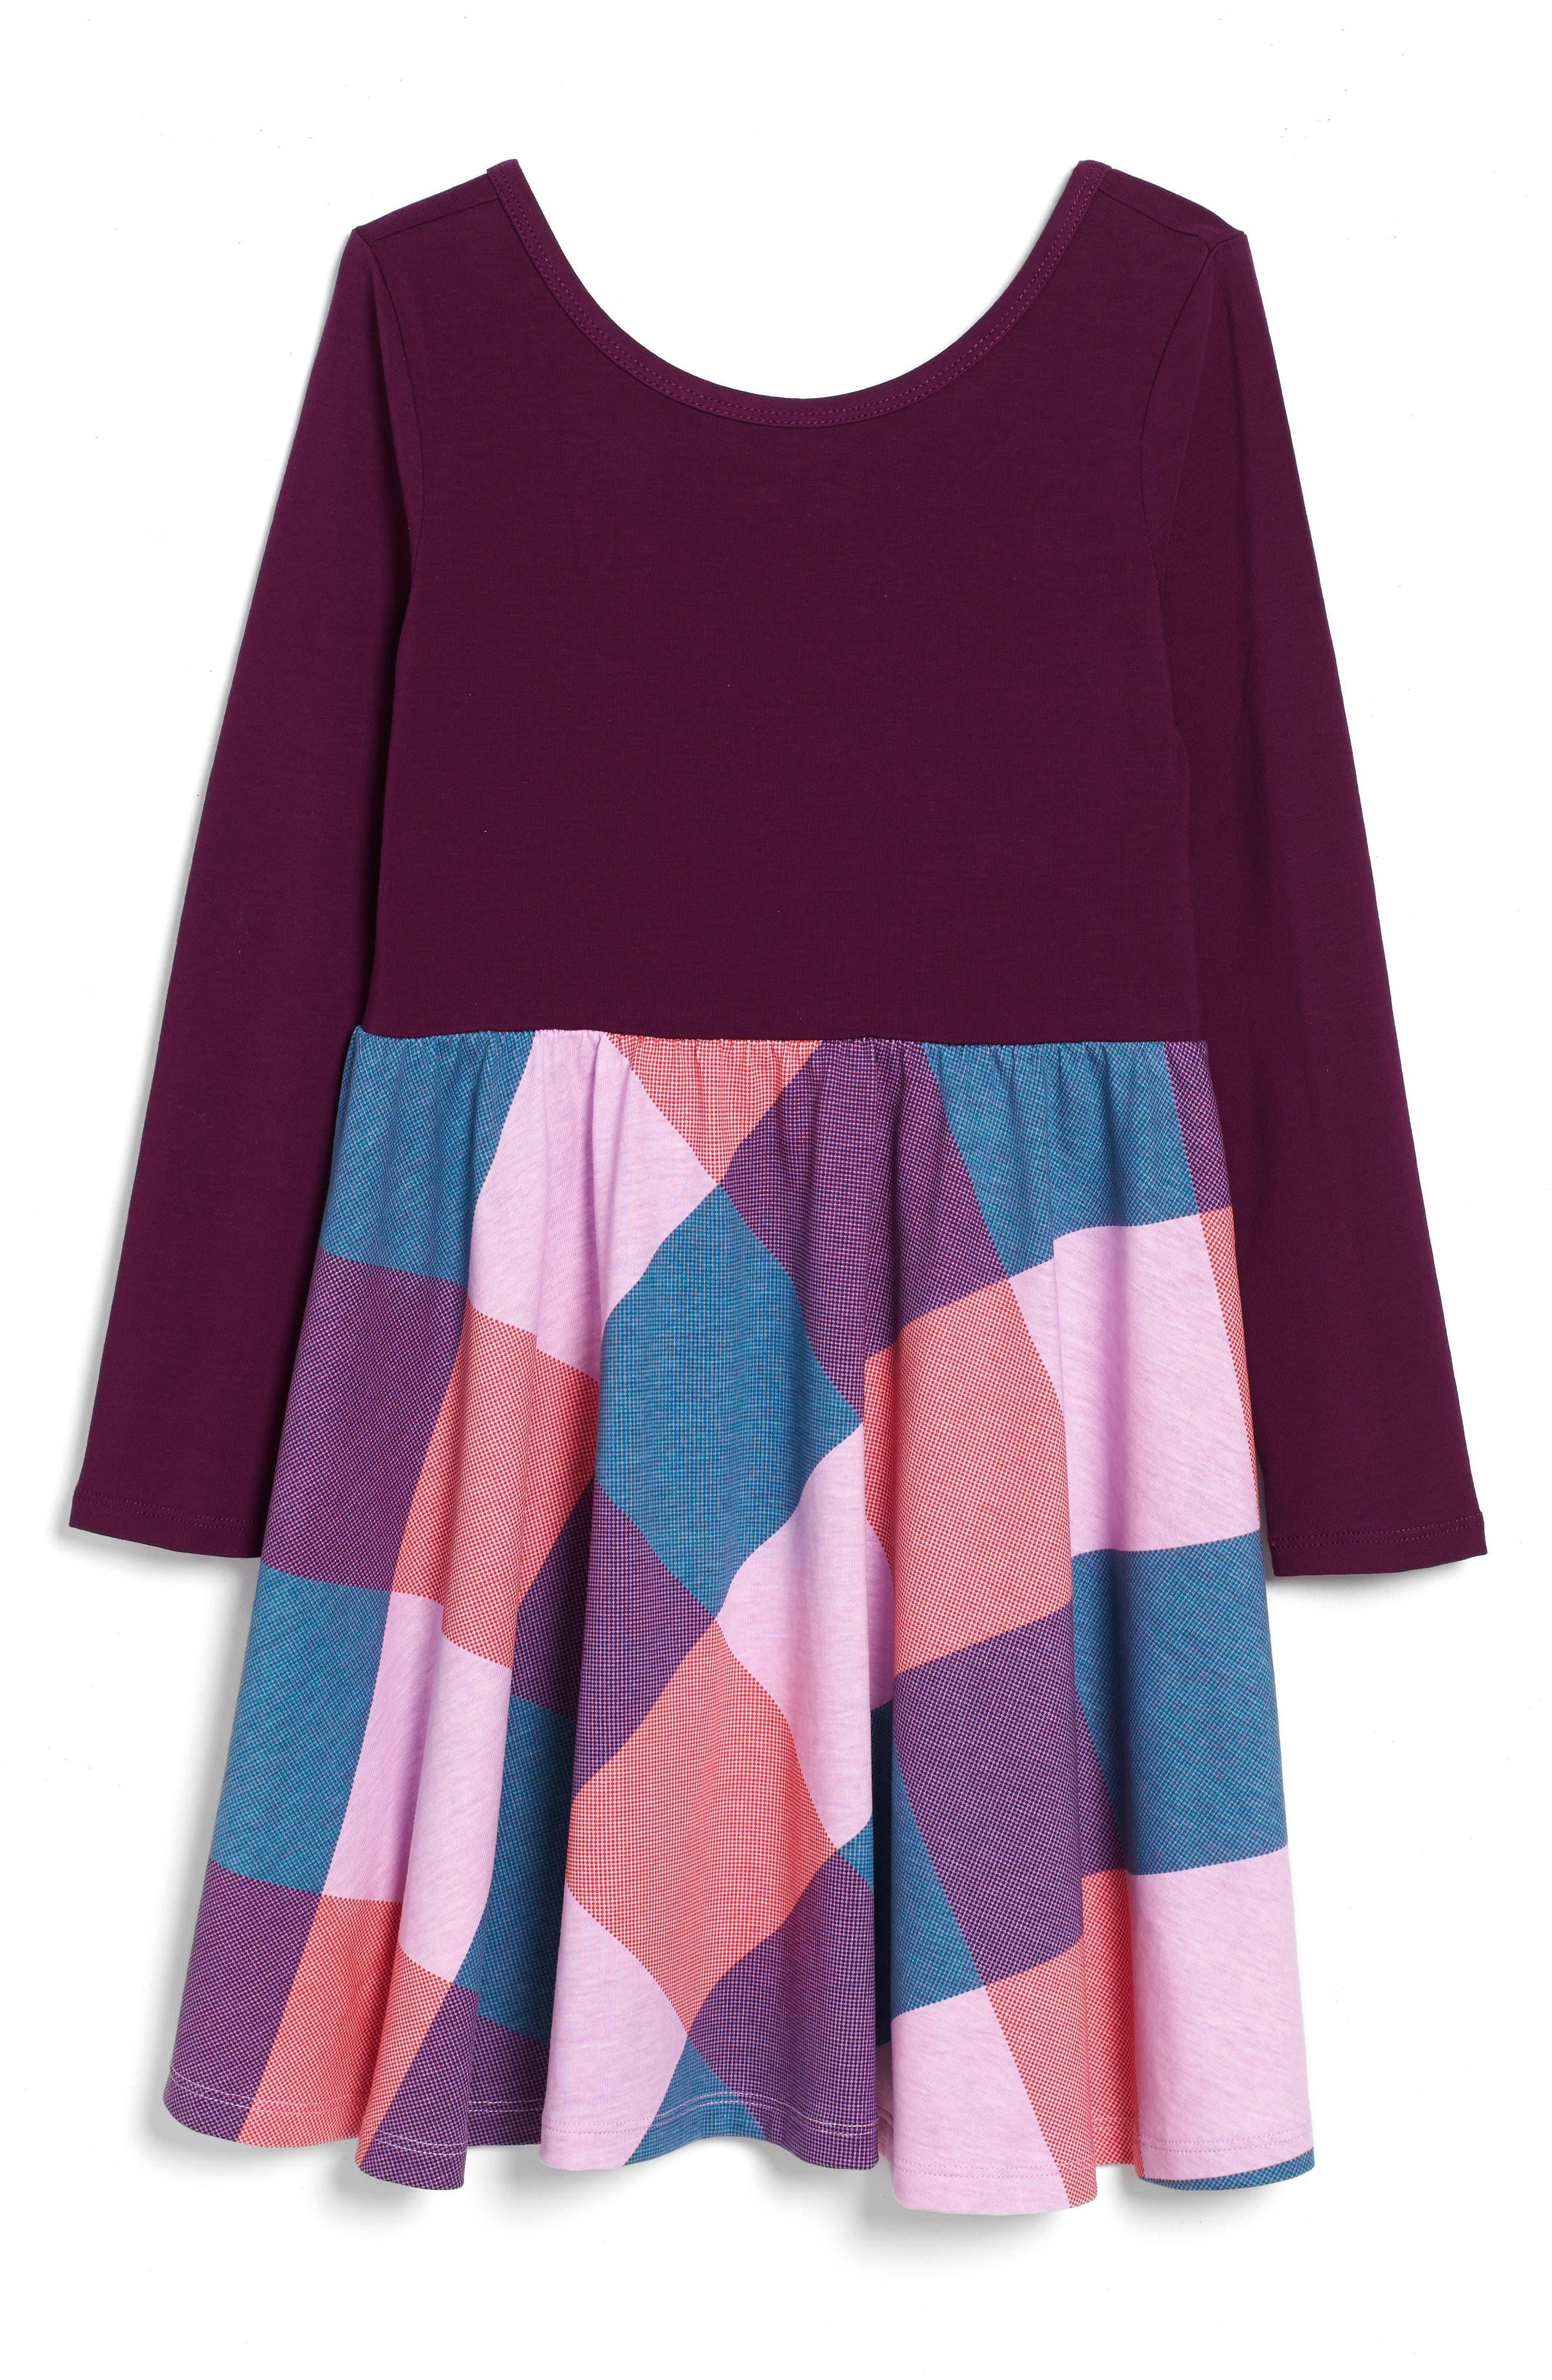 Alternate Image 1 Selected - Tea Collection Dahlia Skirted Dress (Toddler Girls, Little Girls & Big Girls)